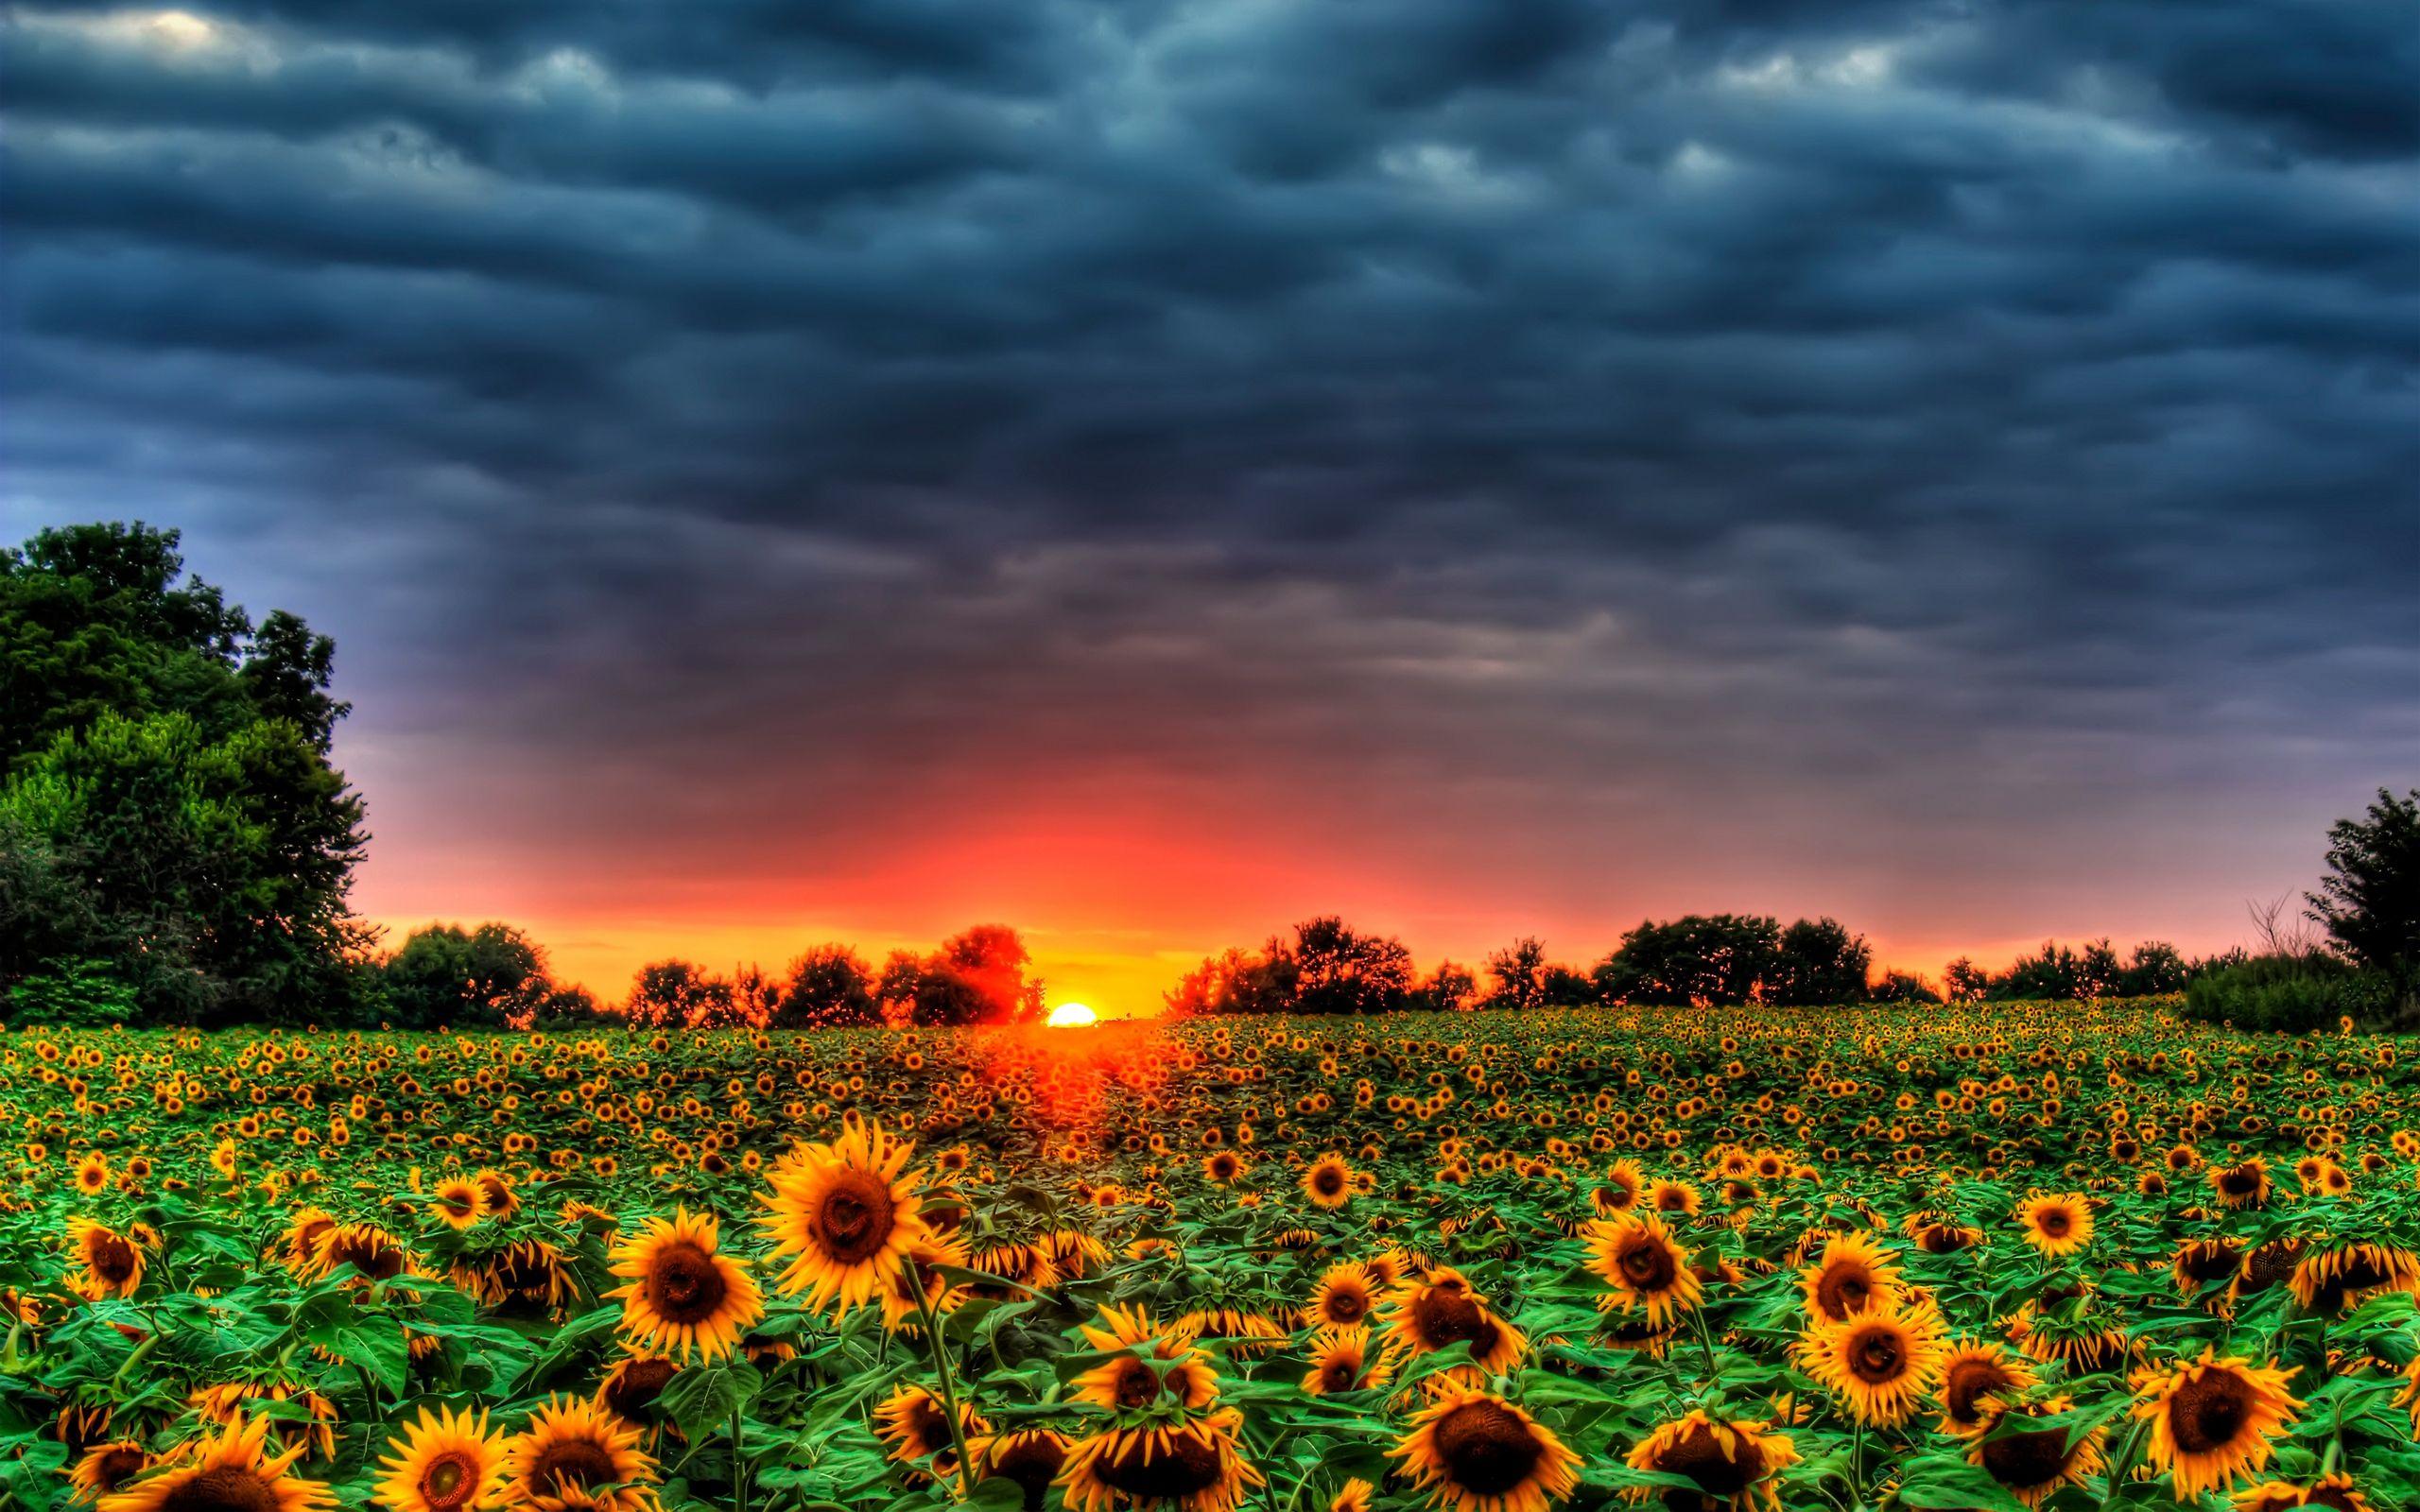 Field Of Sunflowers Beautiful Beauty Clouds Free Wallpapers Sunflower Photo Field Wallpaper Sunflower Wallpaper